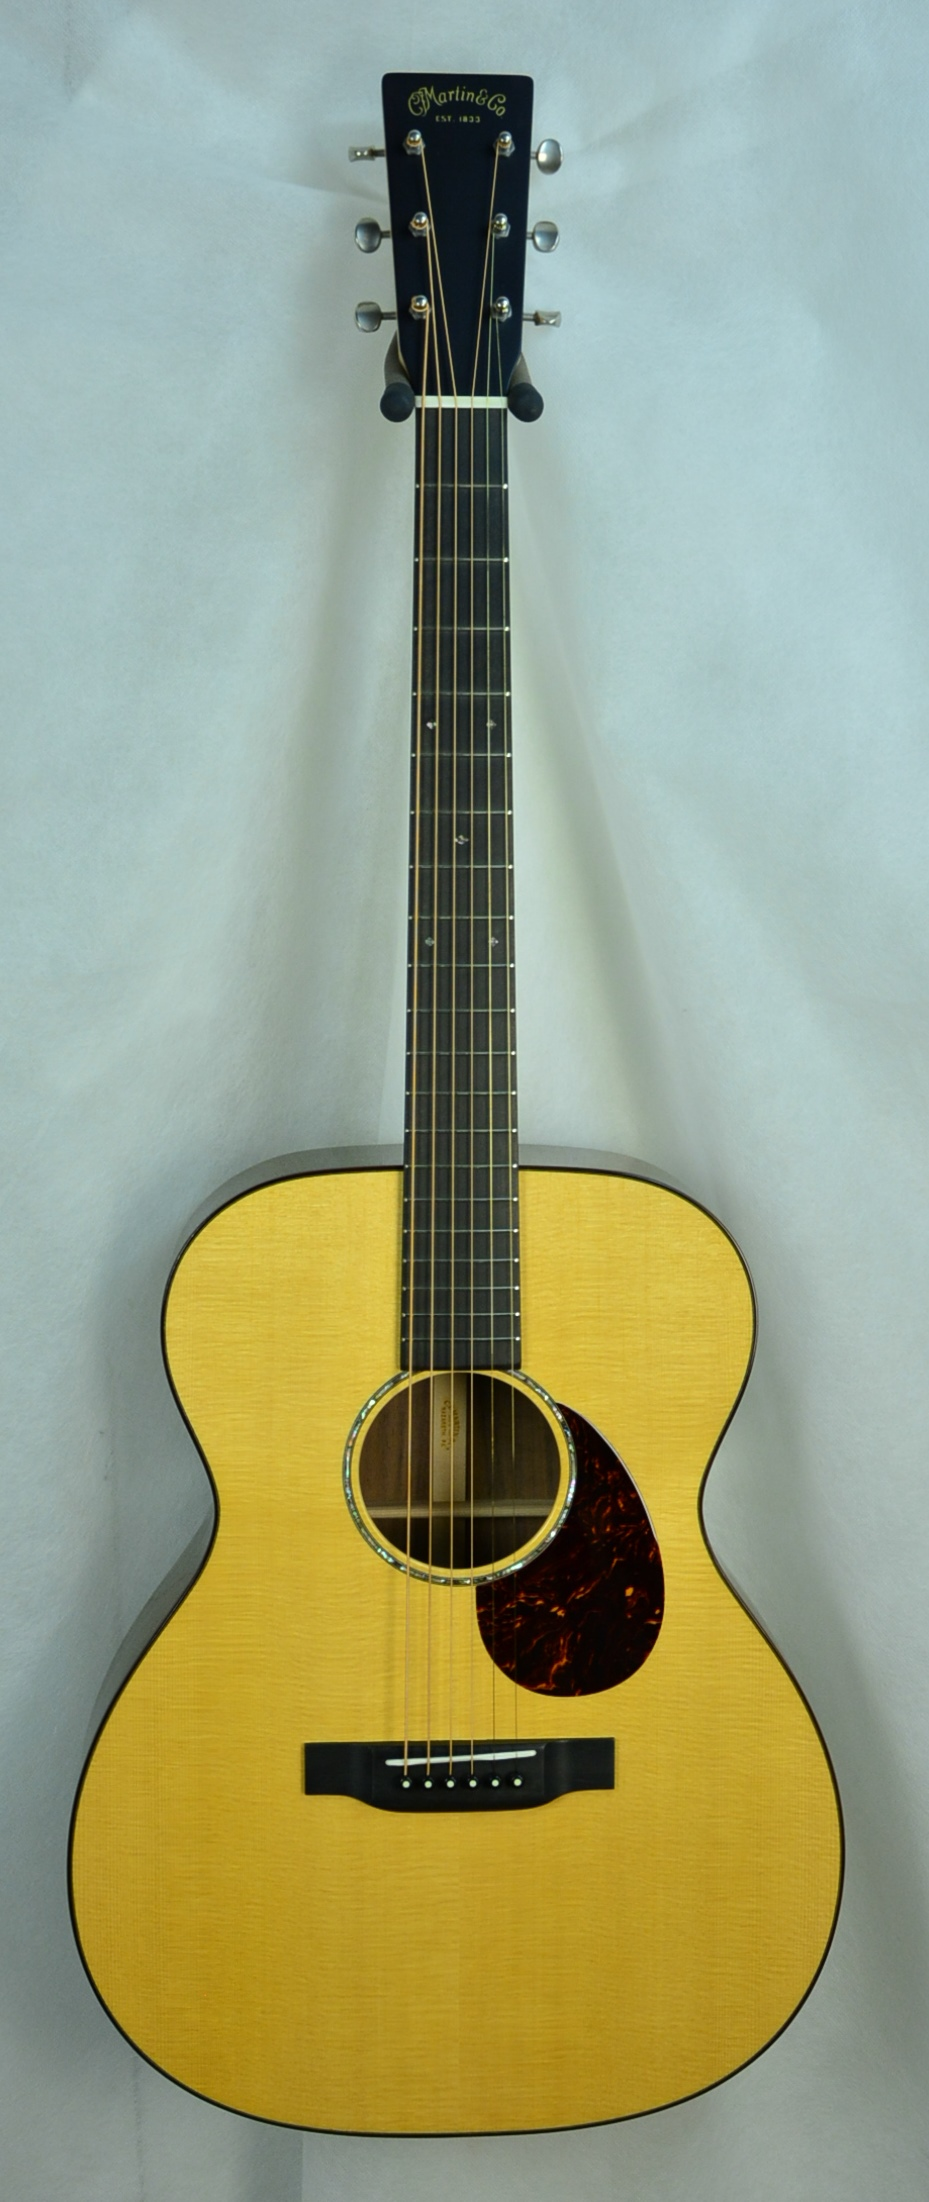 Q-2648024 S-1928826 OM Black Walnut- Maple Neck (1).JPG